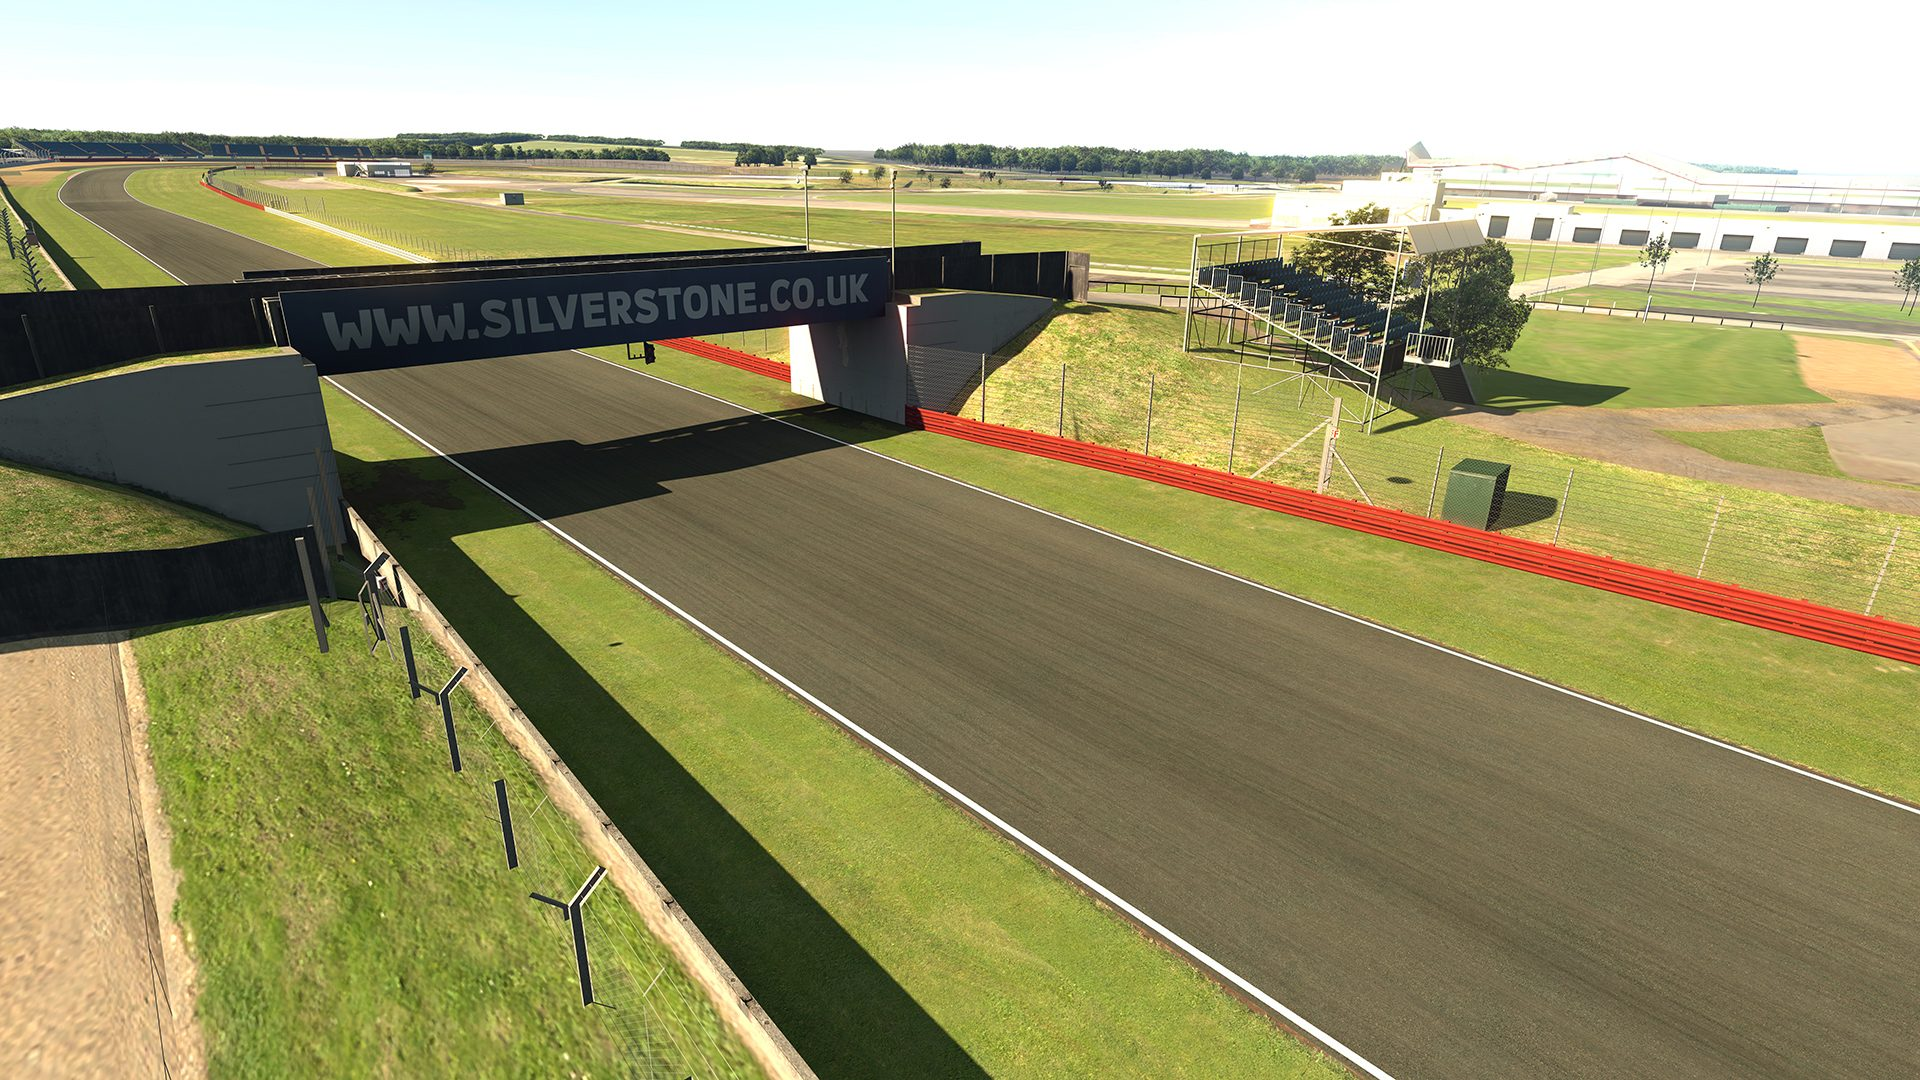 Gran Turismo 6 Screenshot Gallery: Silverstone Circuit